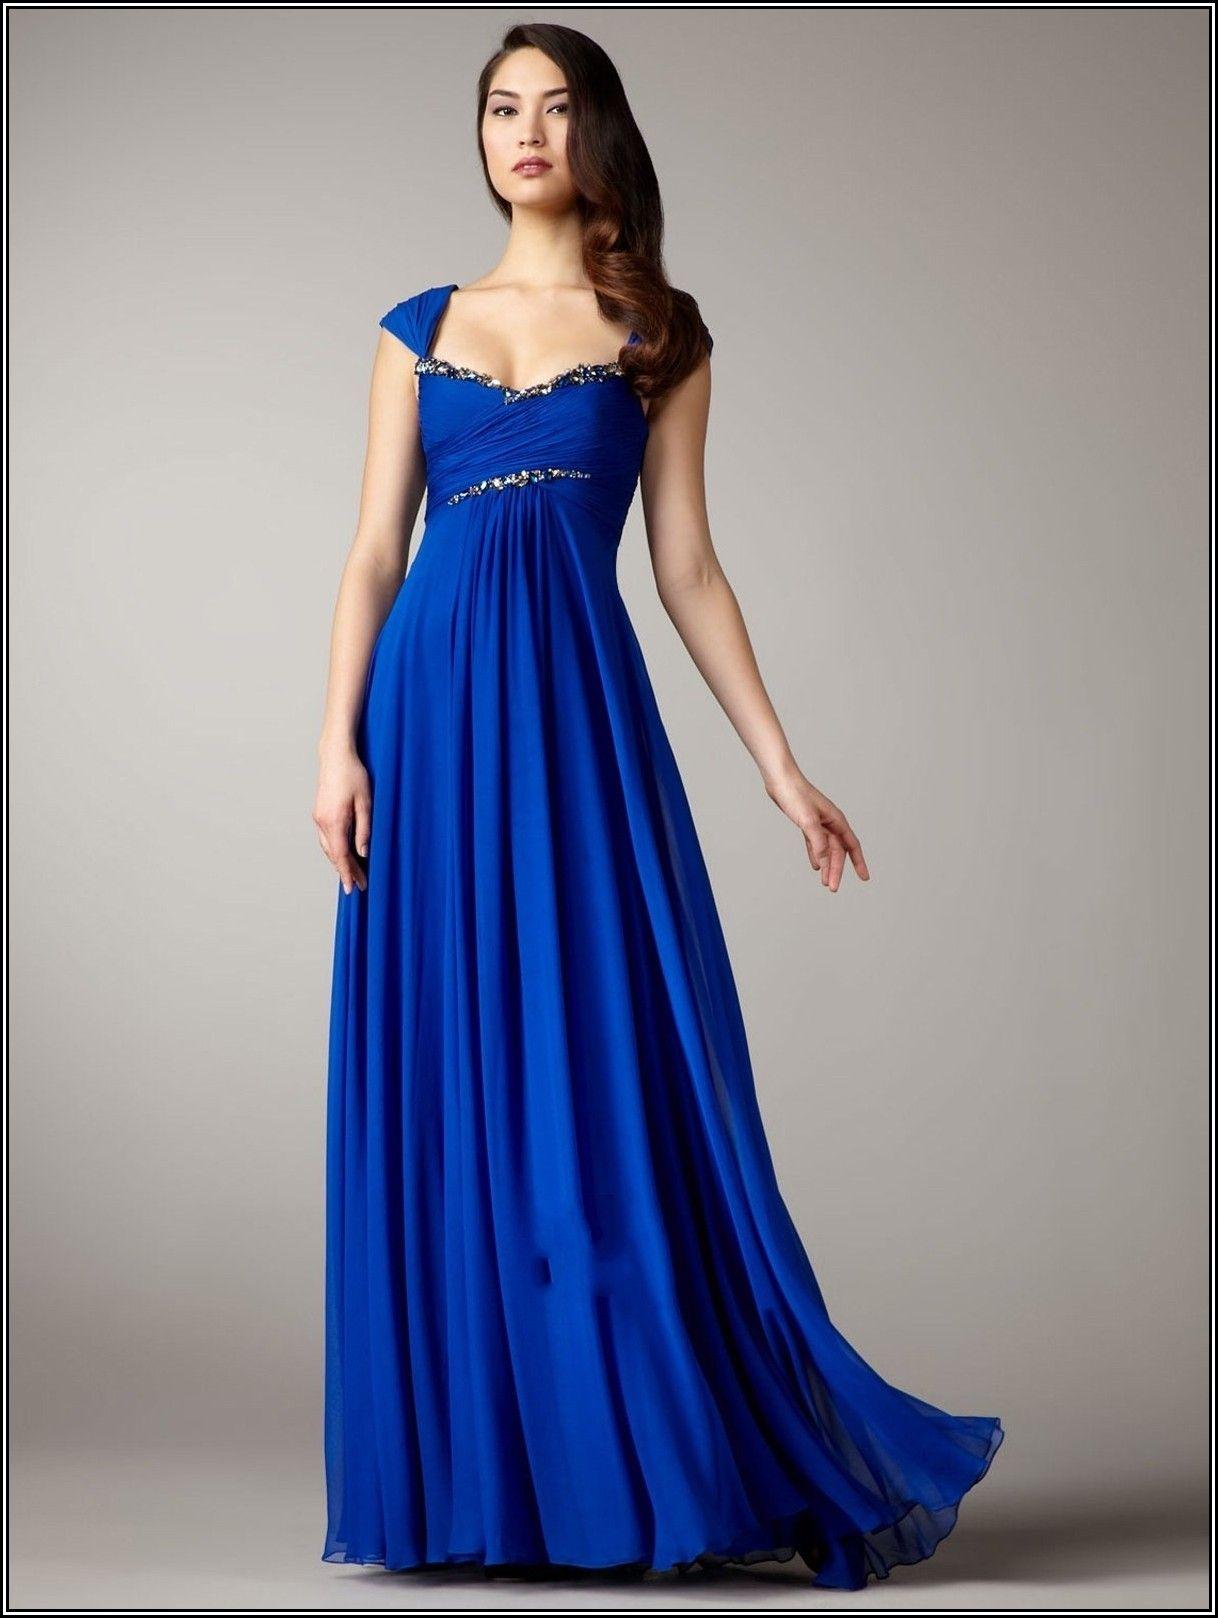 royal-blue-bridesmaid-dresses-davids-bridal   Gabriela\'s wedding ...